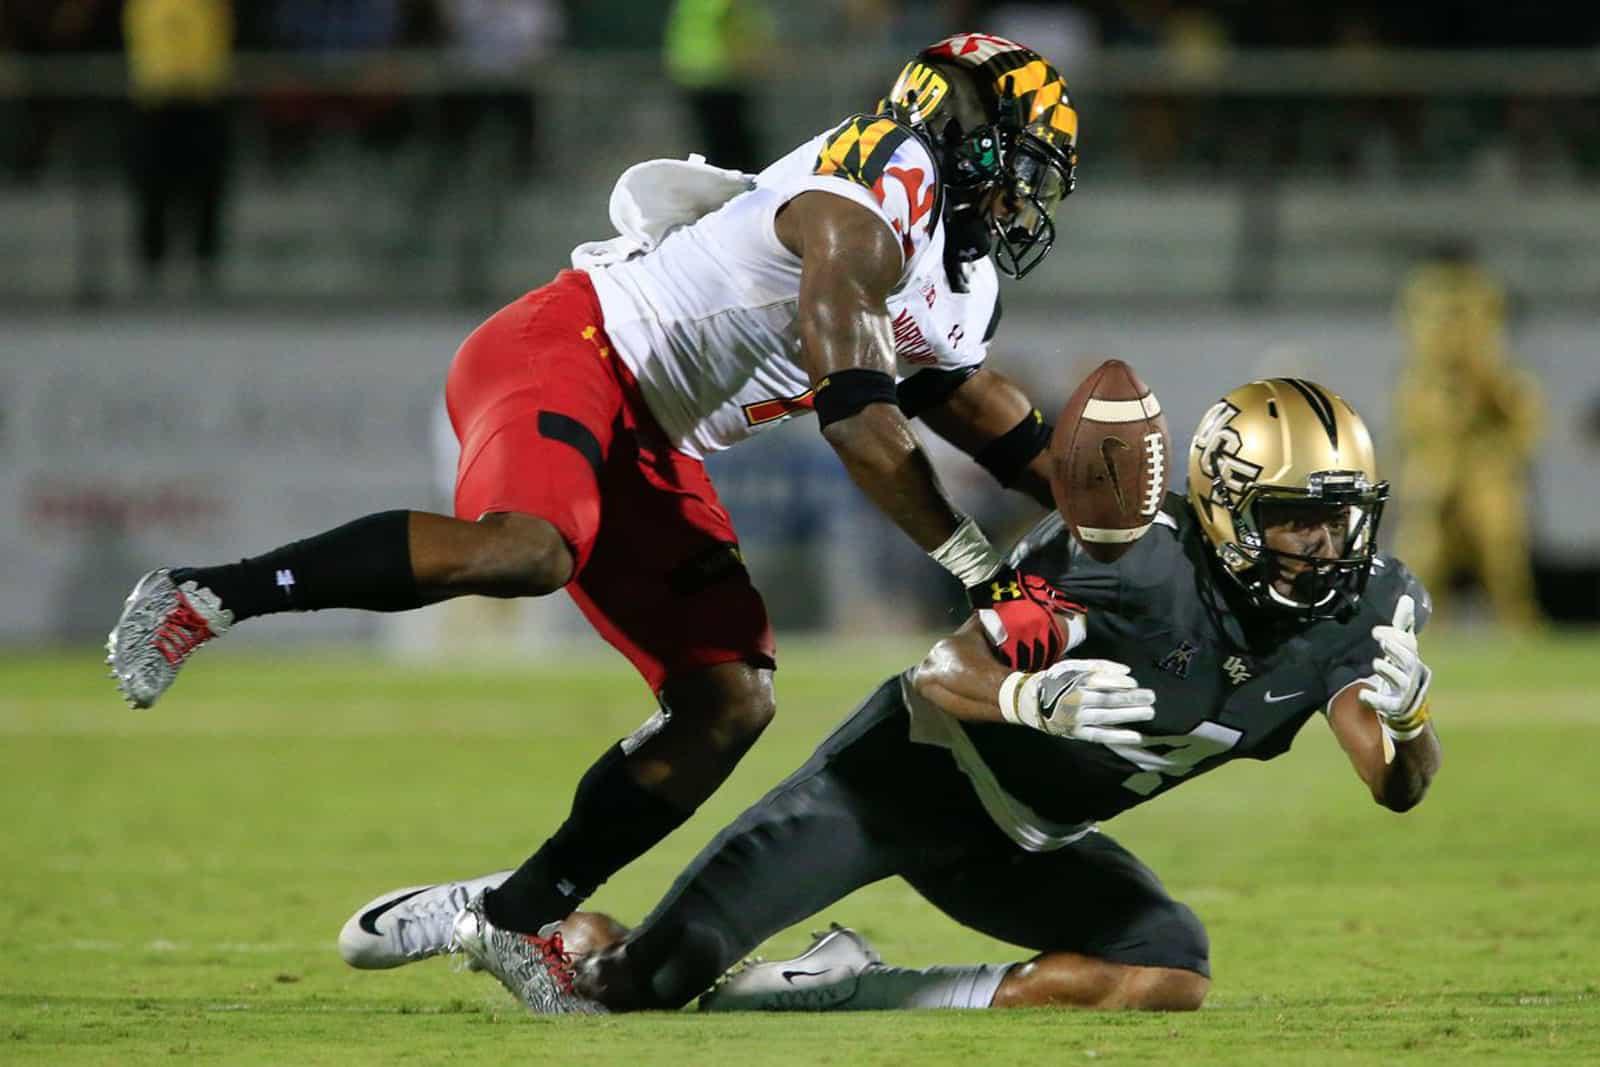 UCF vs. Maryland. Photo: Reinhold Matay/USA TODAY Sports.